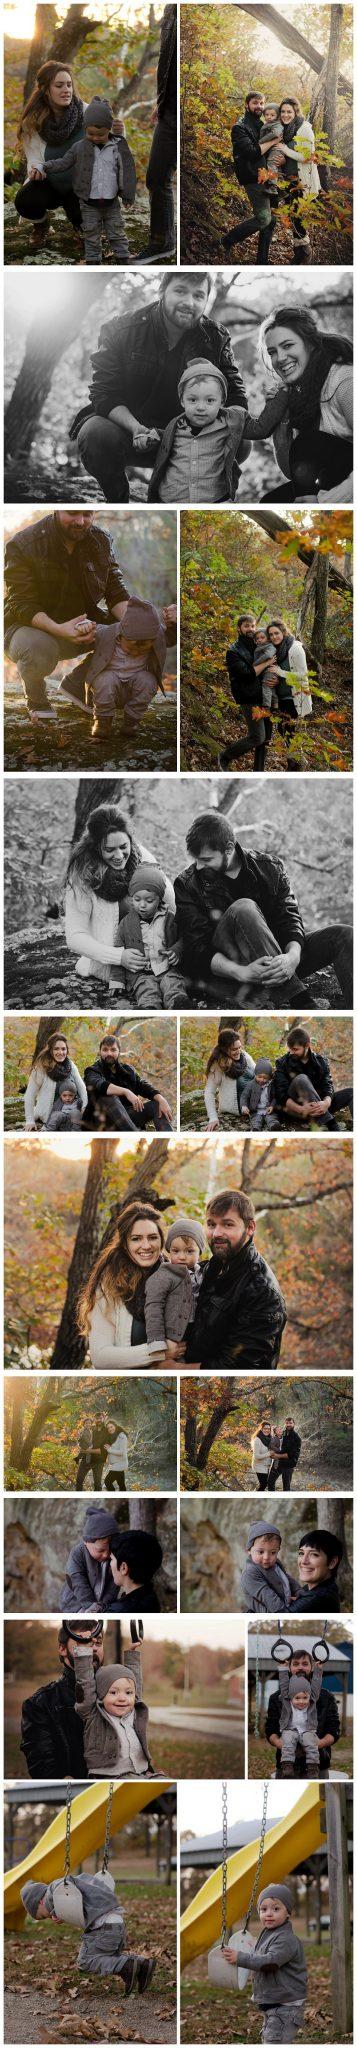 Official Tarchala Family photos 2014 - Christmas card session